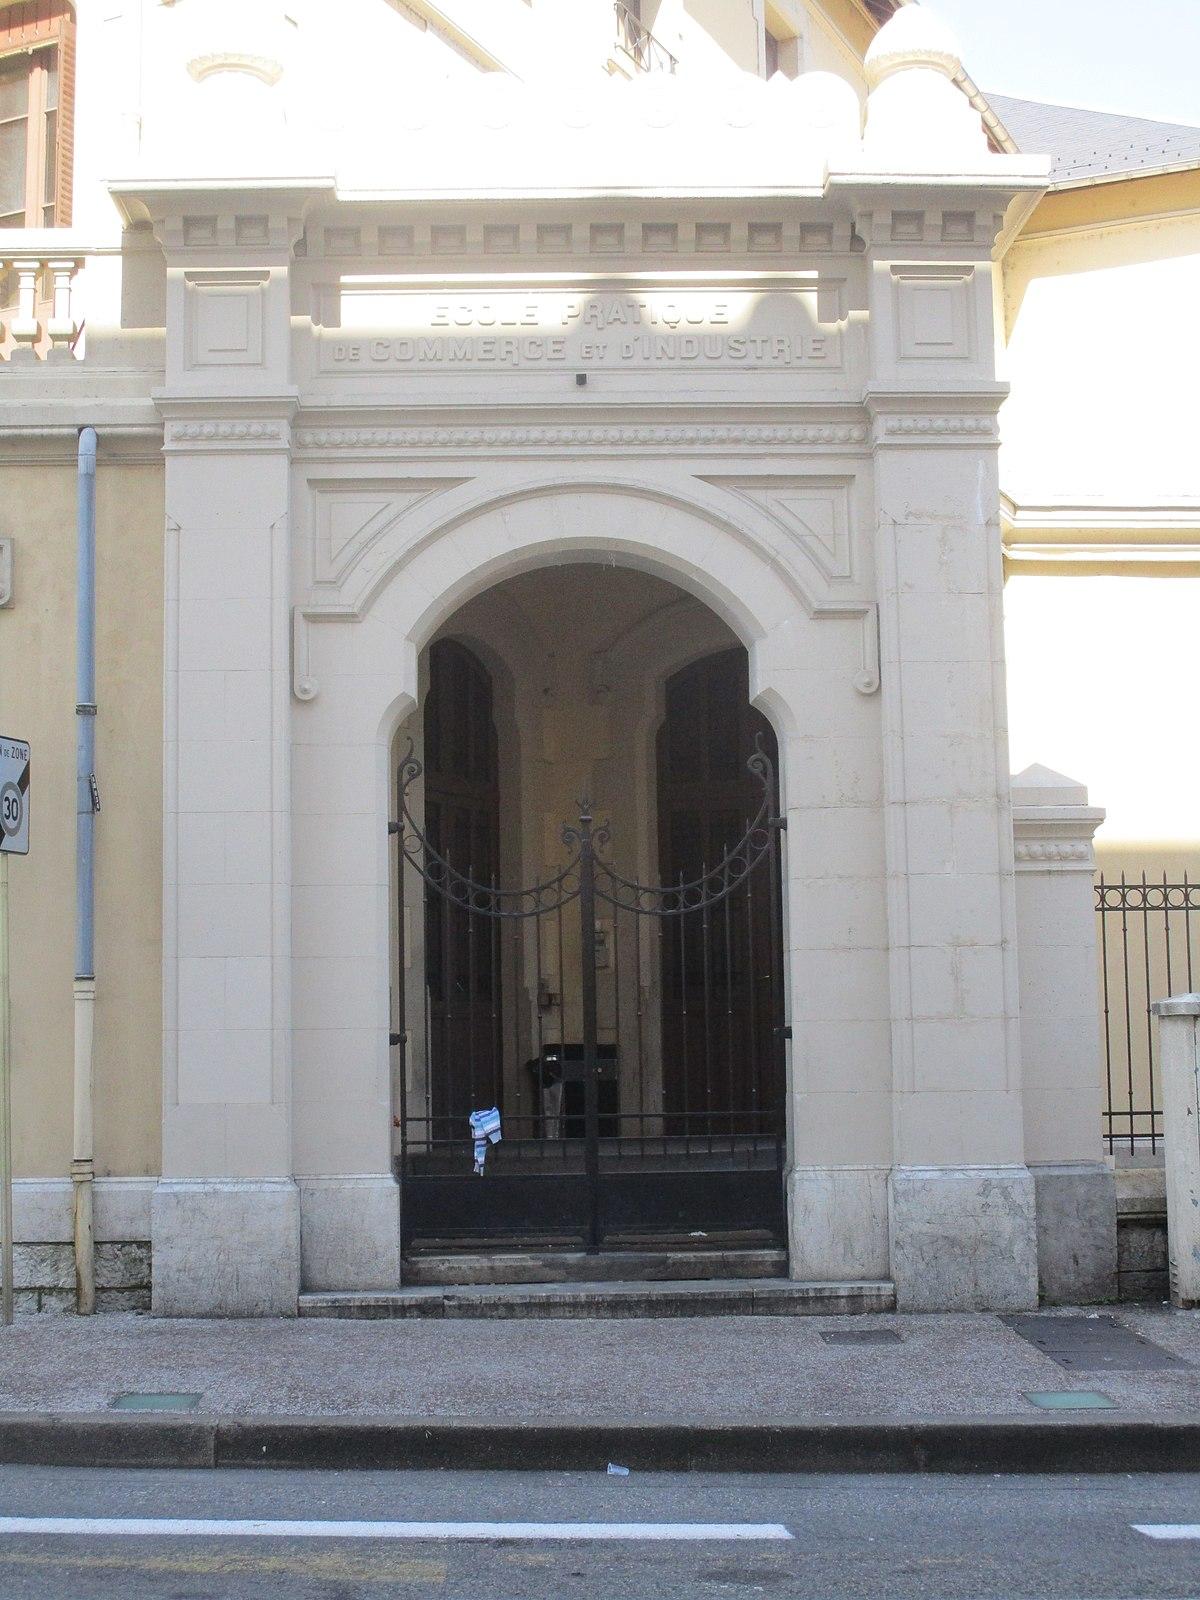 File:Maison des Associations, Chambéry (3).JPG - Wikimedia Commons